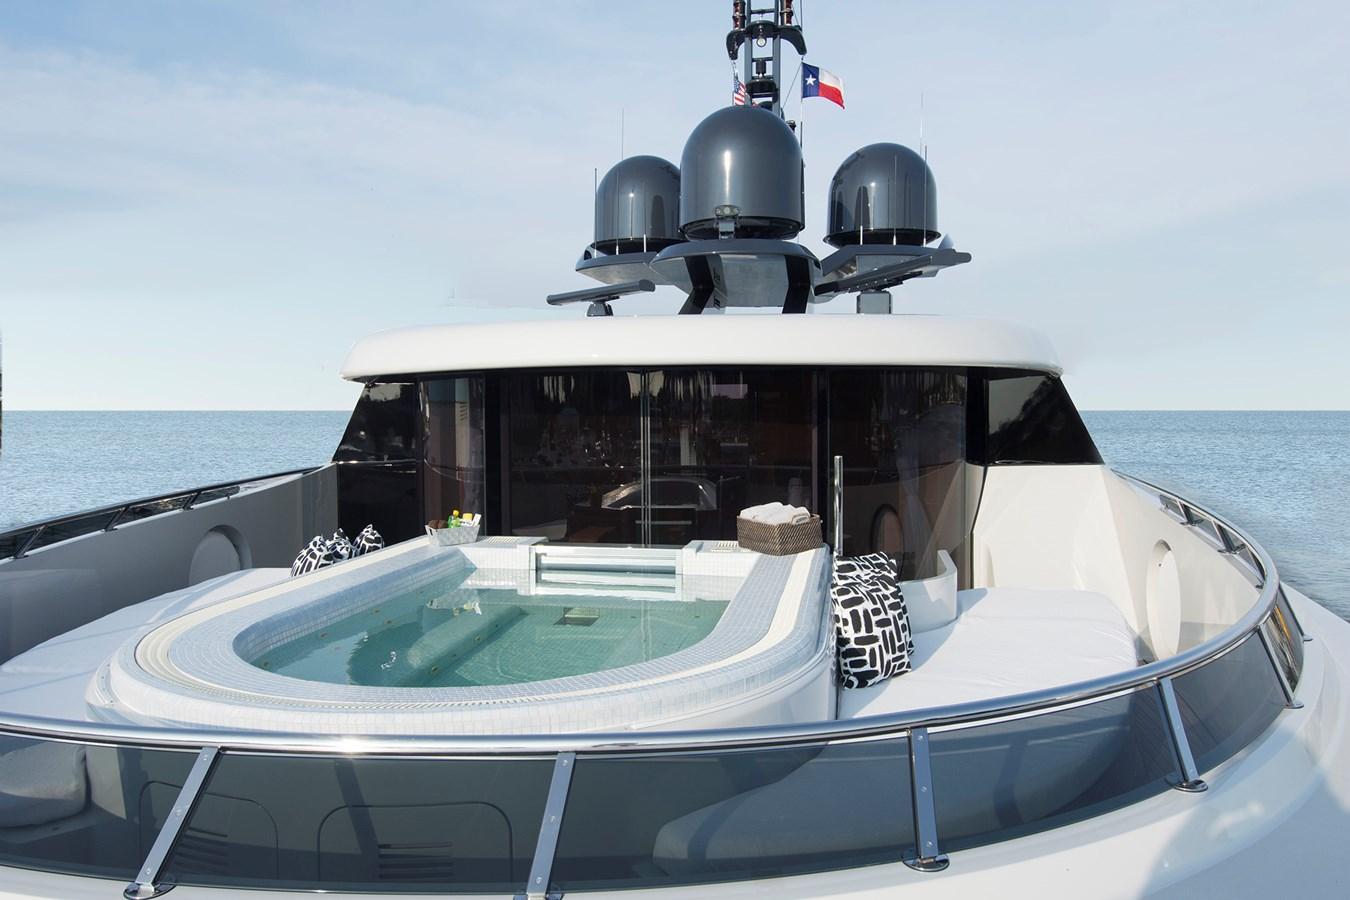 Abbracci yacht for sale